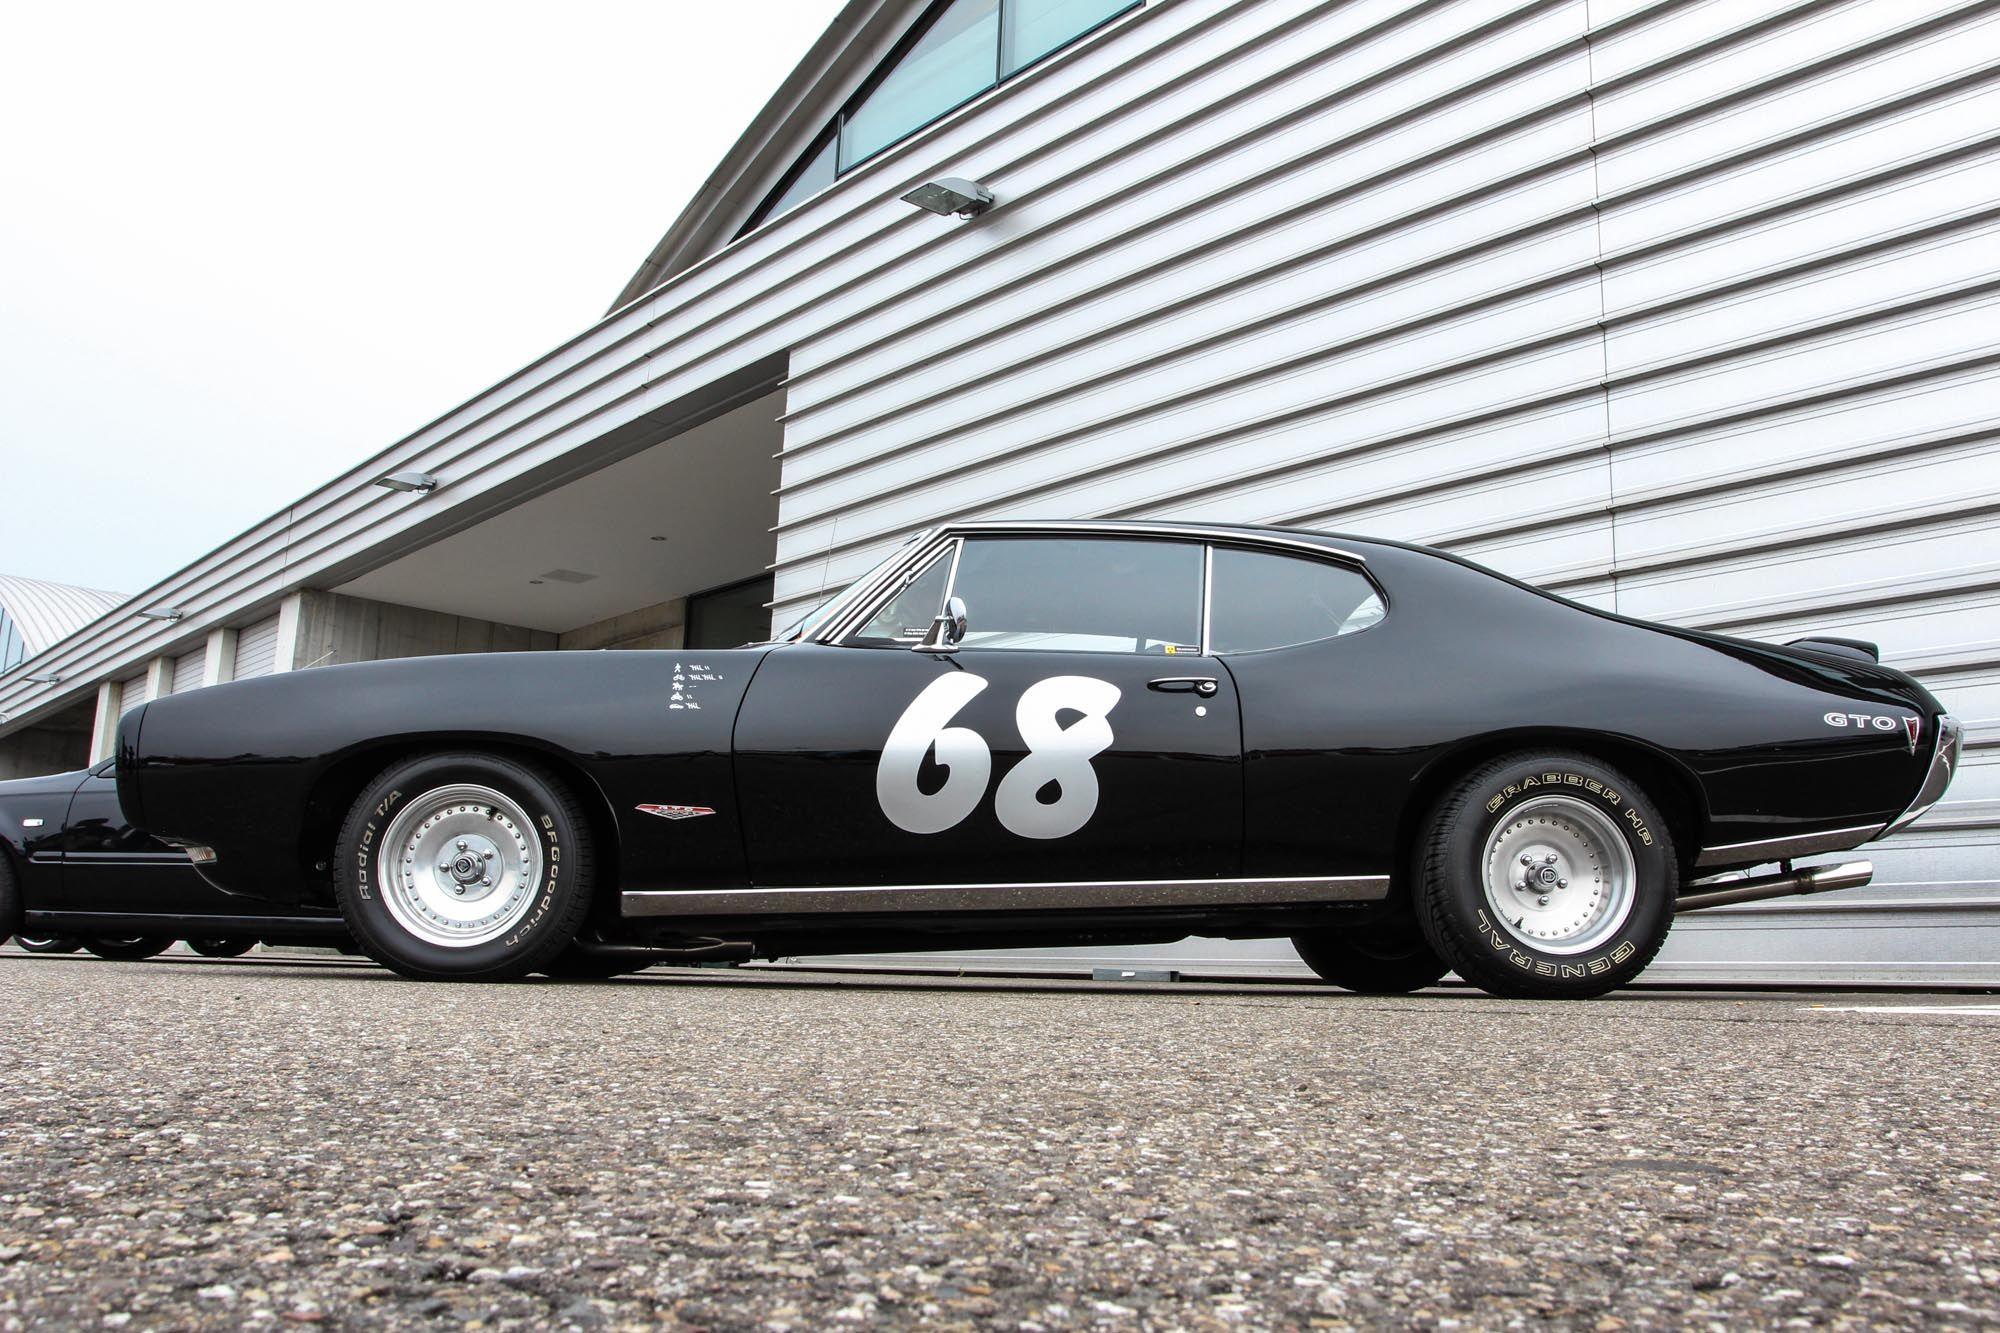 Pontiac GTO: American Monster  http://www.autotuning.de/pontiac-gto-american-monster/ GTO, Musclecar, Pontiac Tuning News, US-Car, V8